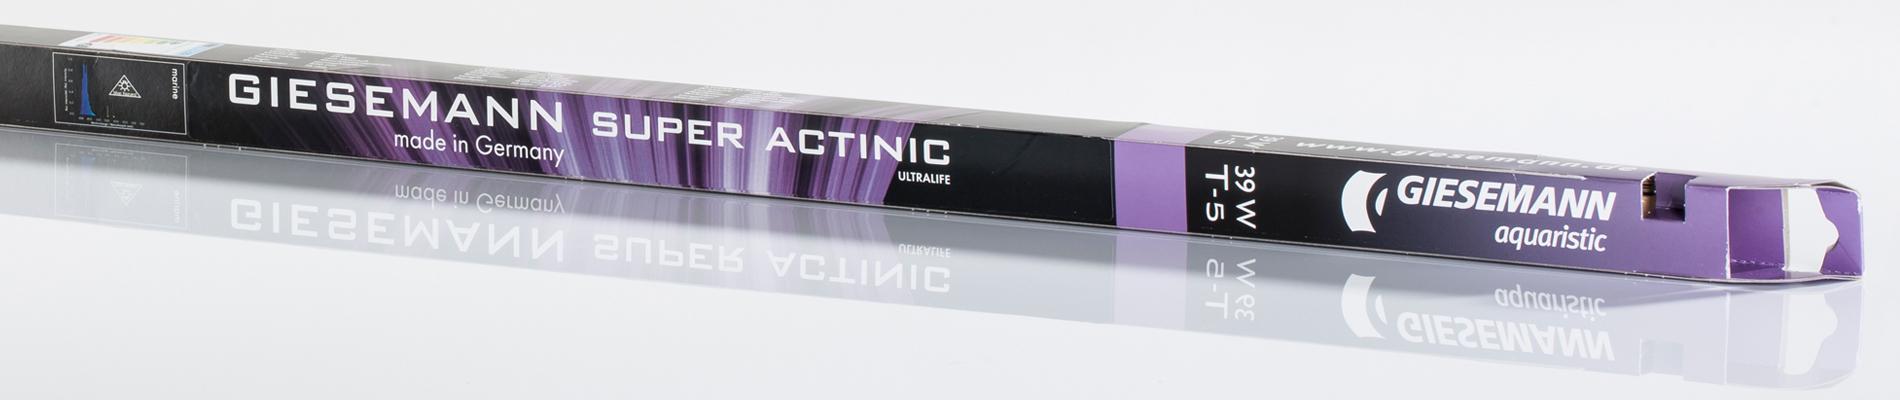 GIESEMANN® Powerchrome super actinic -  24 Watt